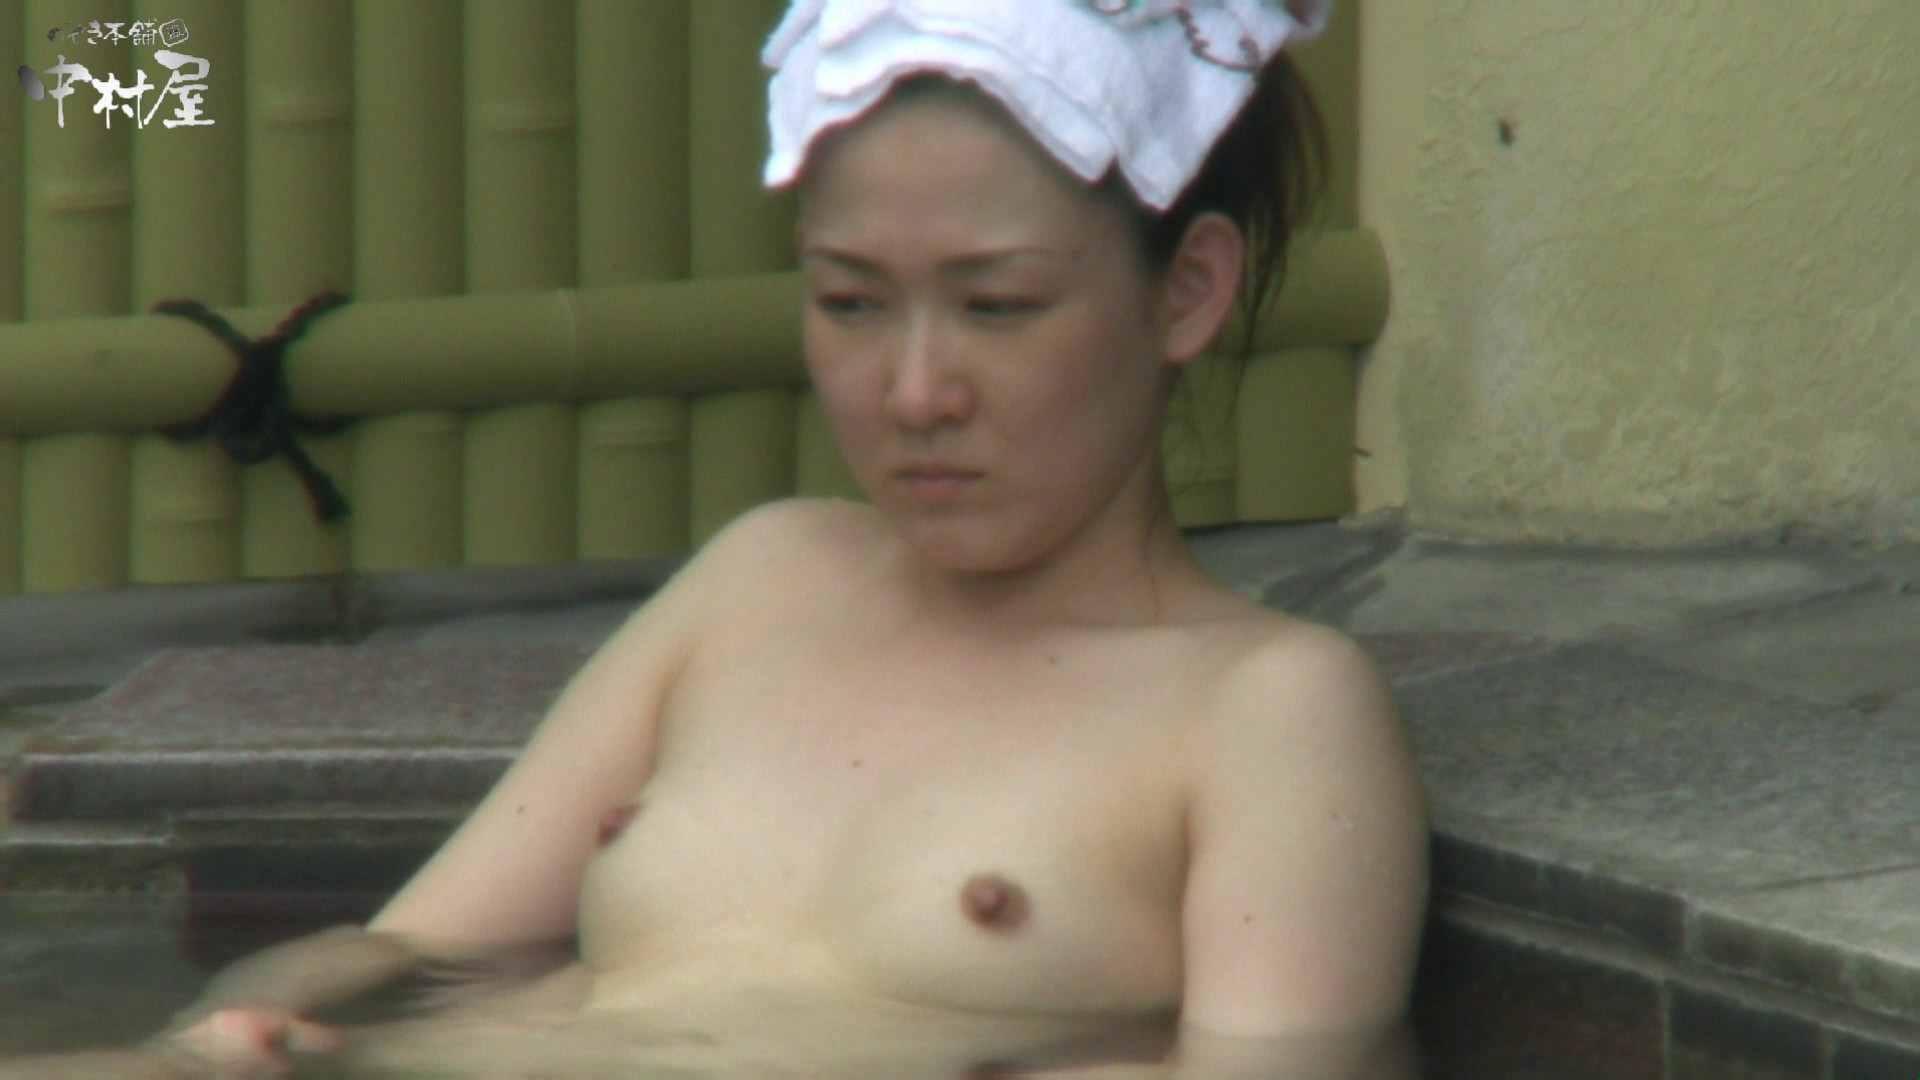 Aquaな露天風呂Vol.943 露天 | OLセックス  108画像 67